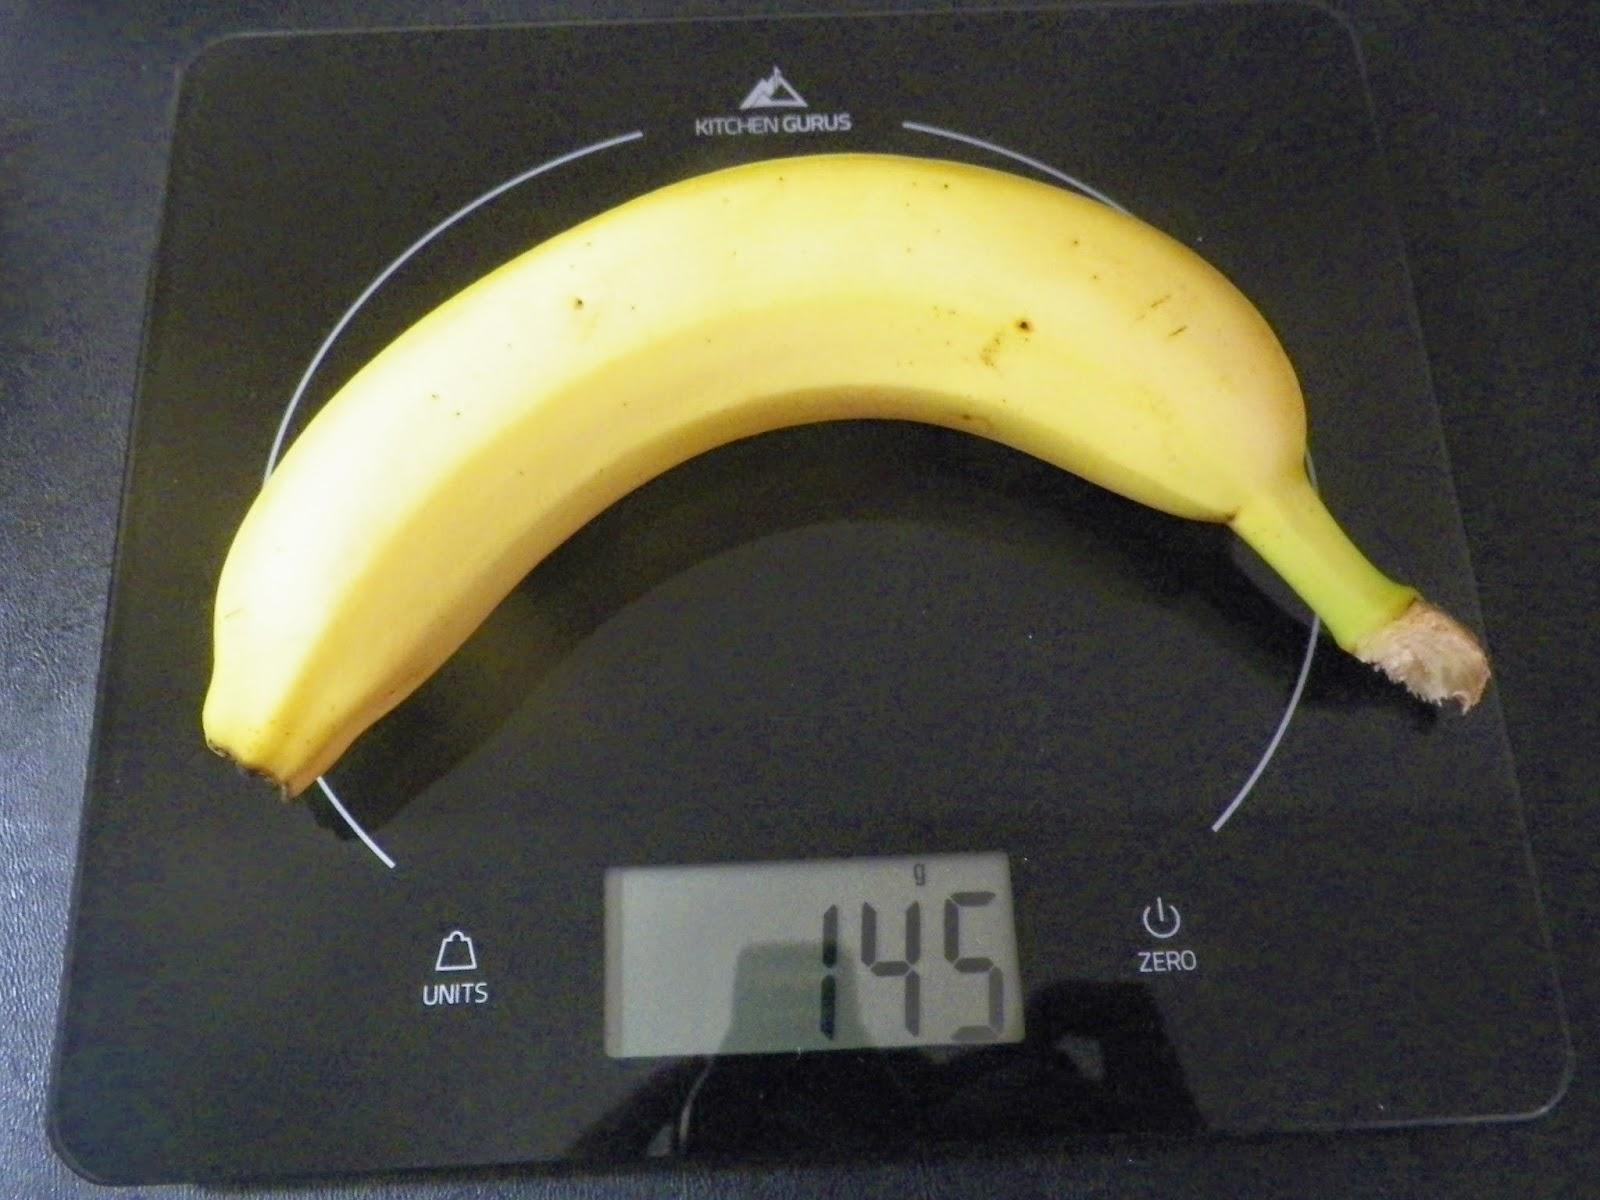 kitchen gurus food scale